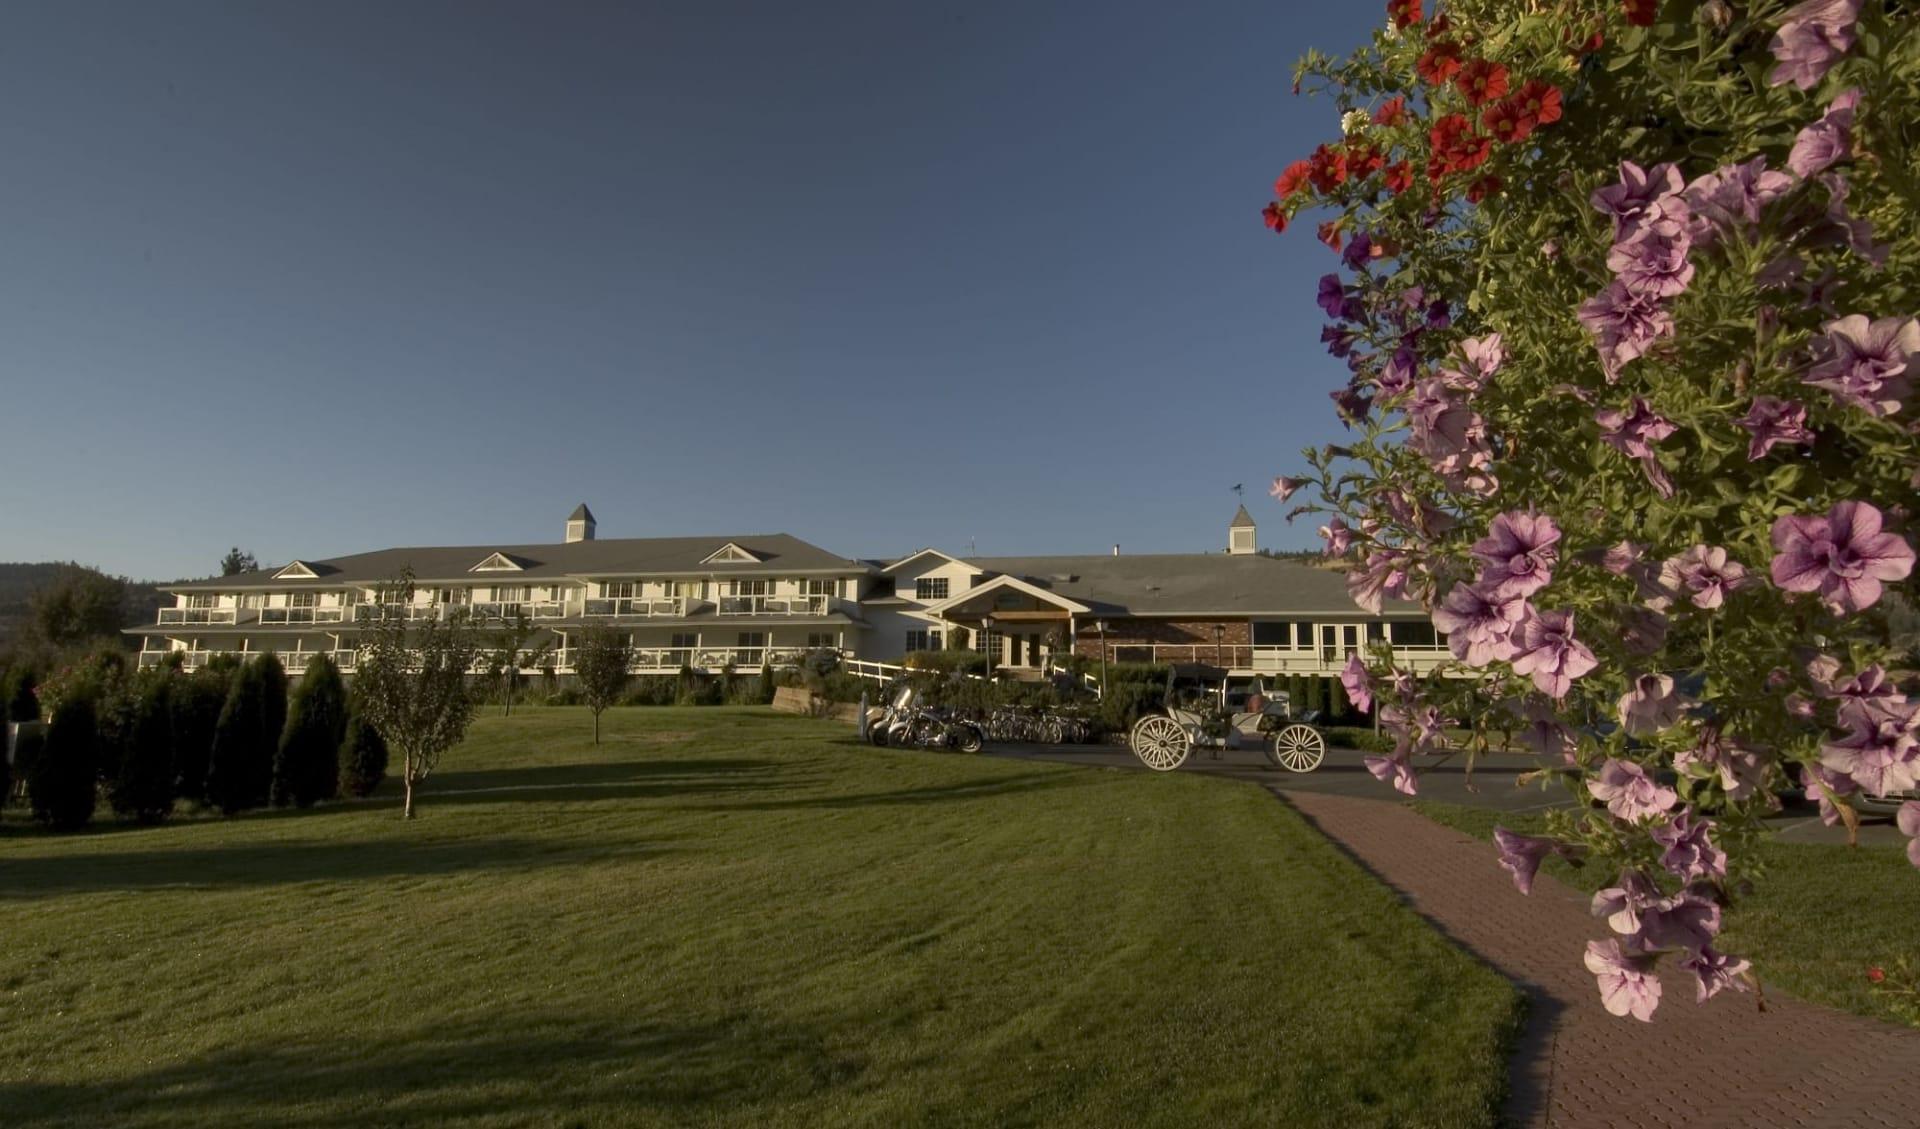 The Lund Resort at Kla ah Men:  Historic Lund Hotel_ViewFromGarden